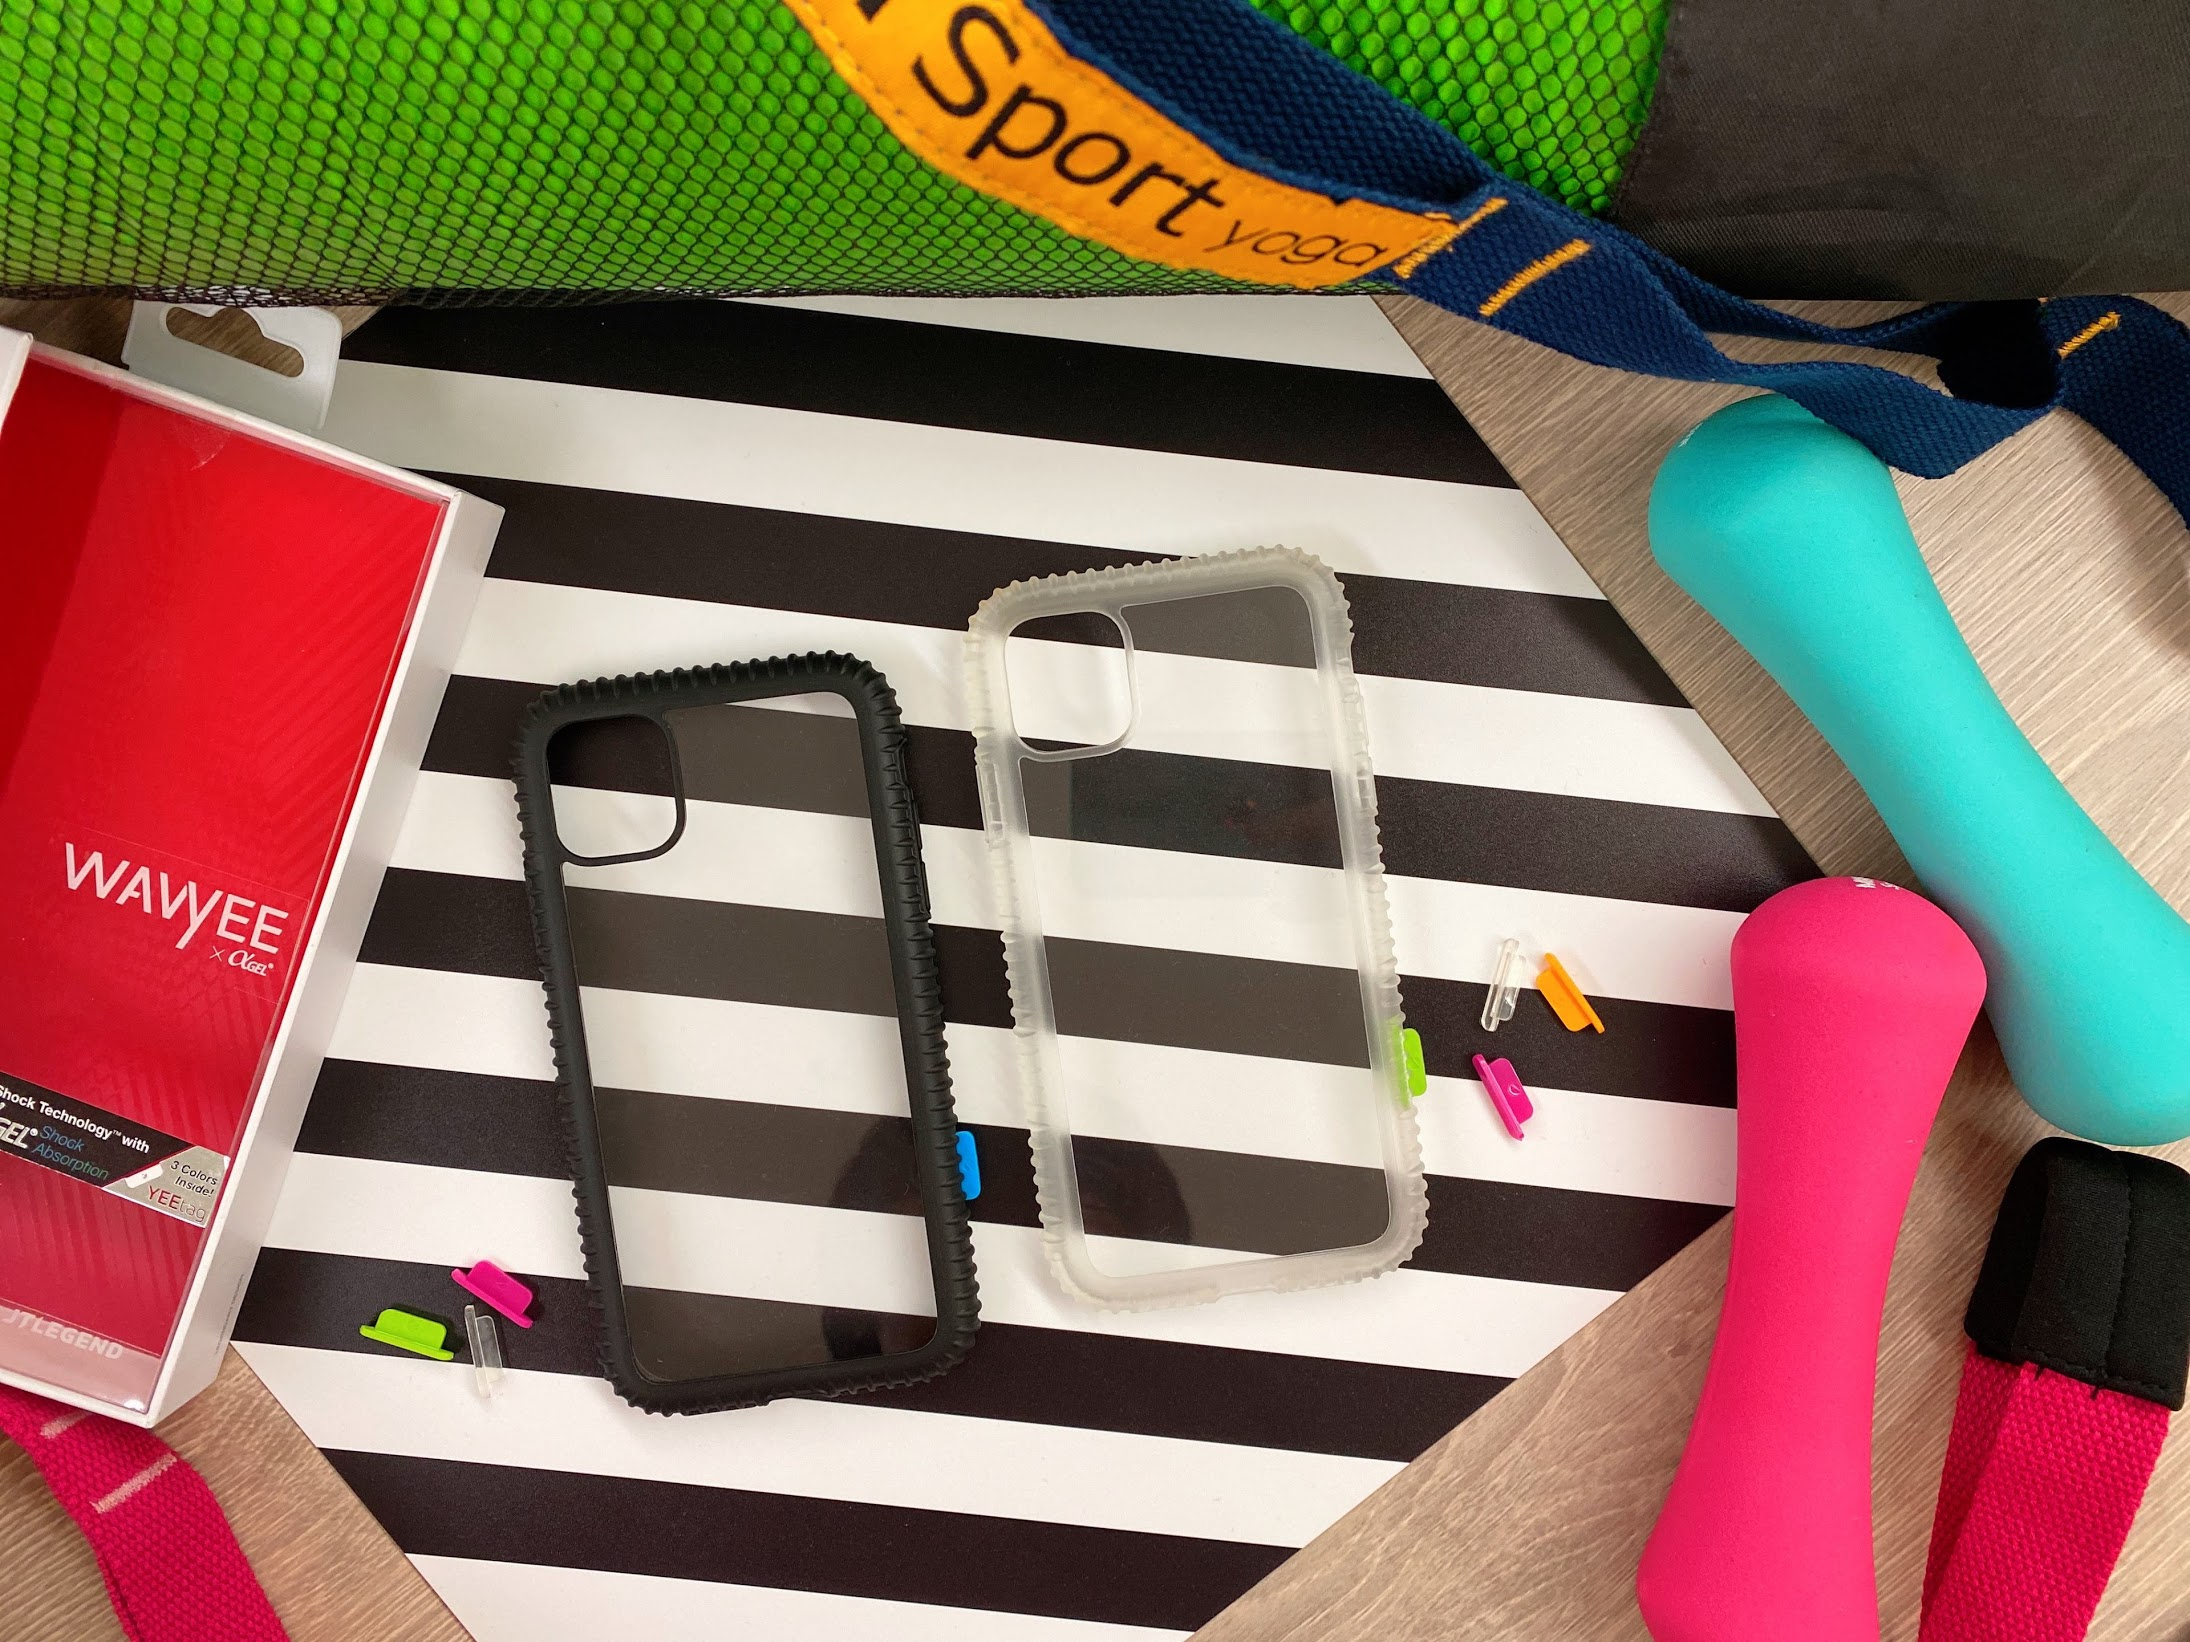 iPhone11手機殼開箱,JTLEGEND Wavyee 防摔保護殼、立架式雙料減震保護殼 @秤瓶樂遊遊